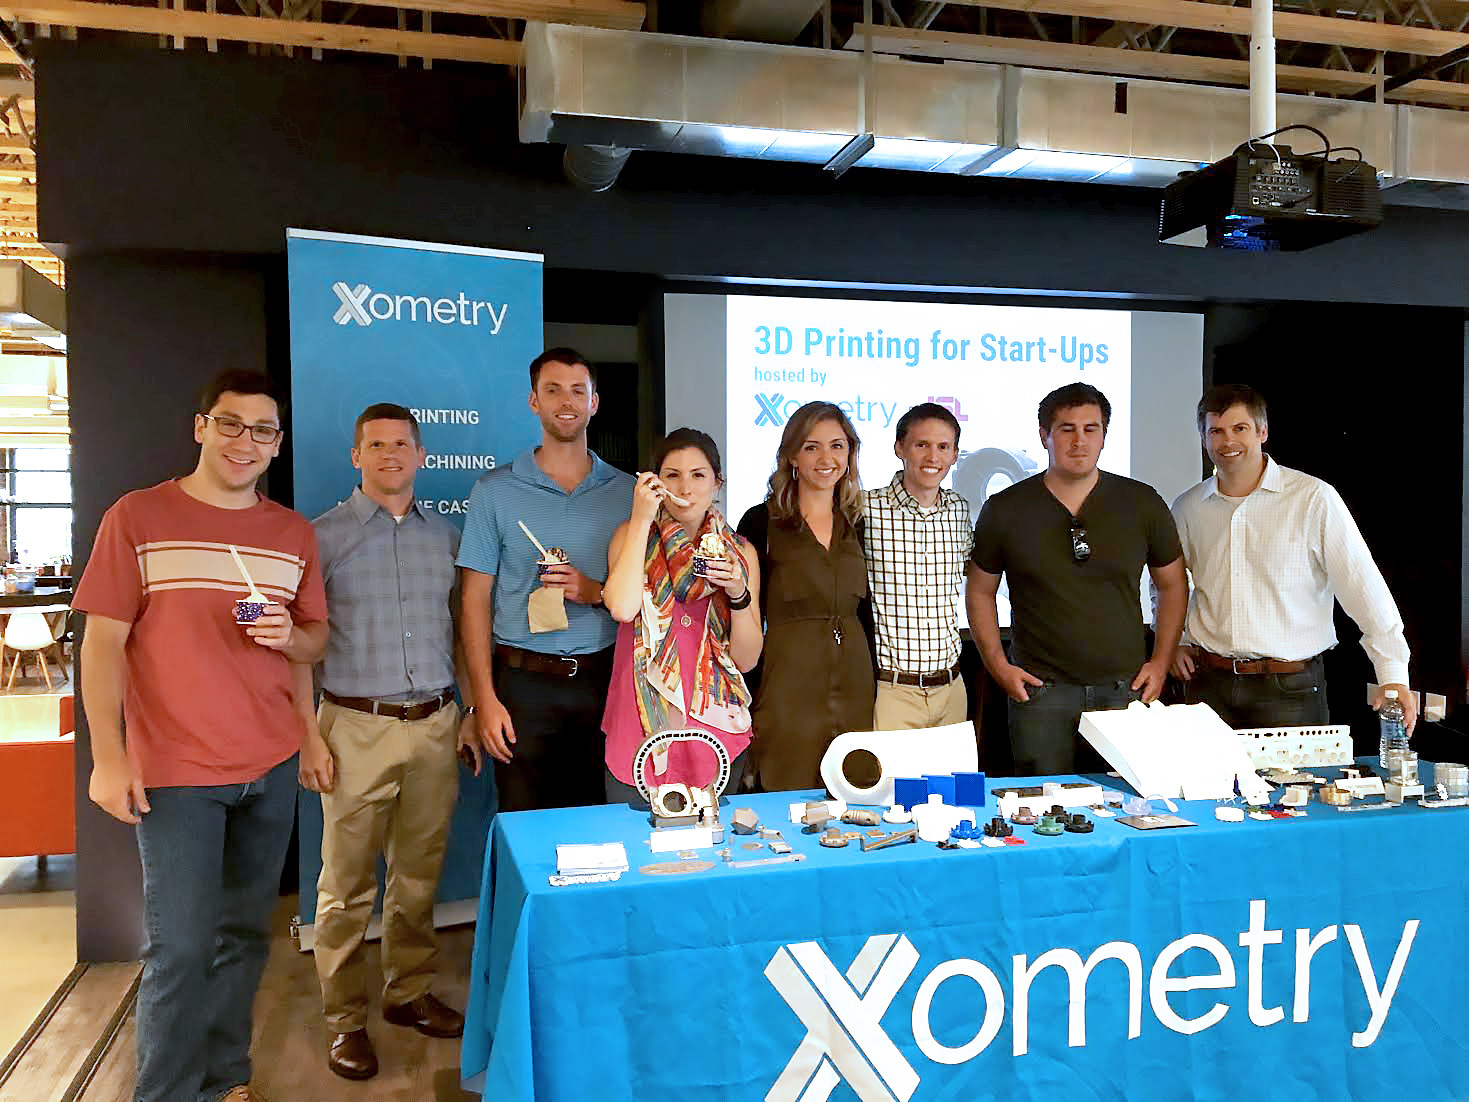 The Xometry Team